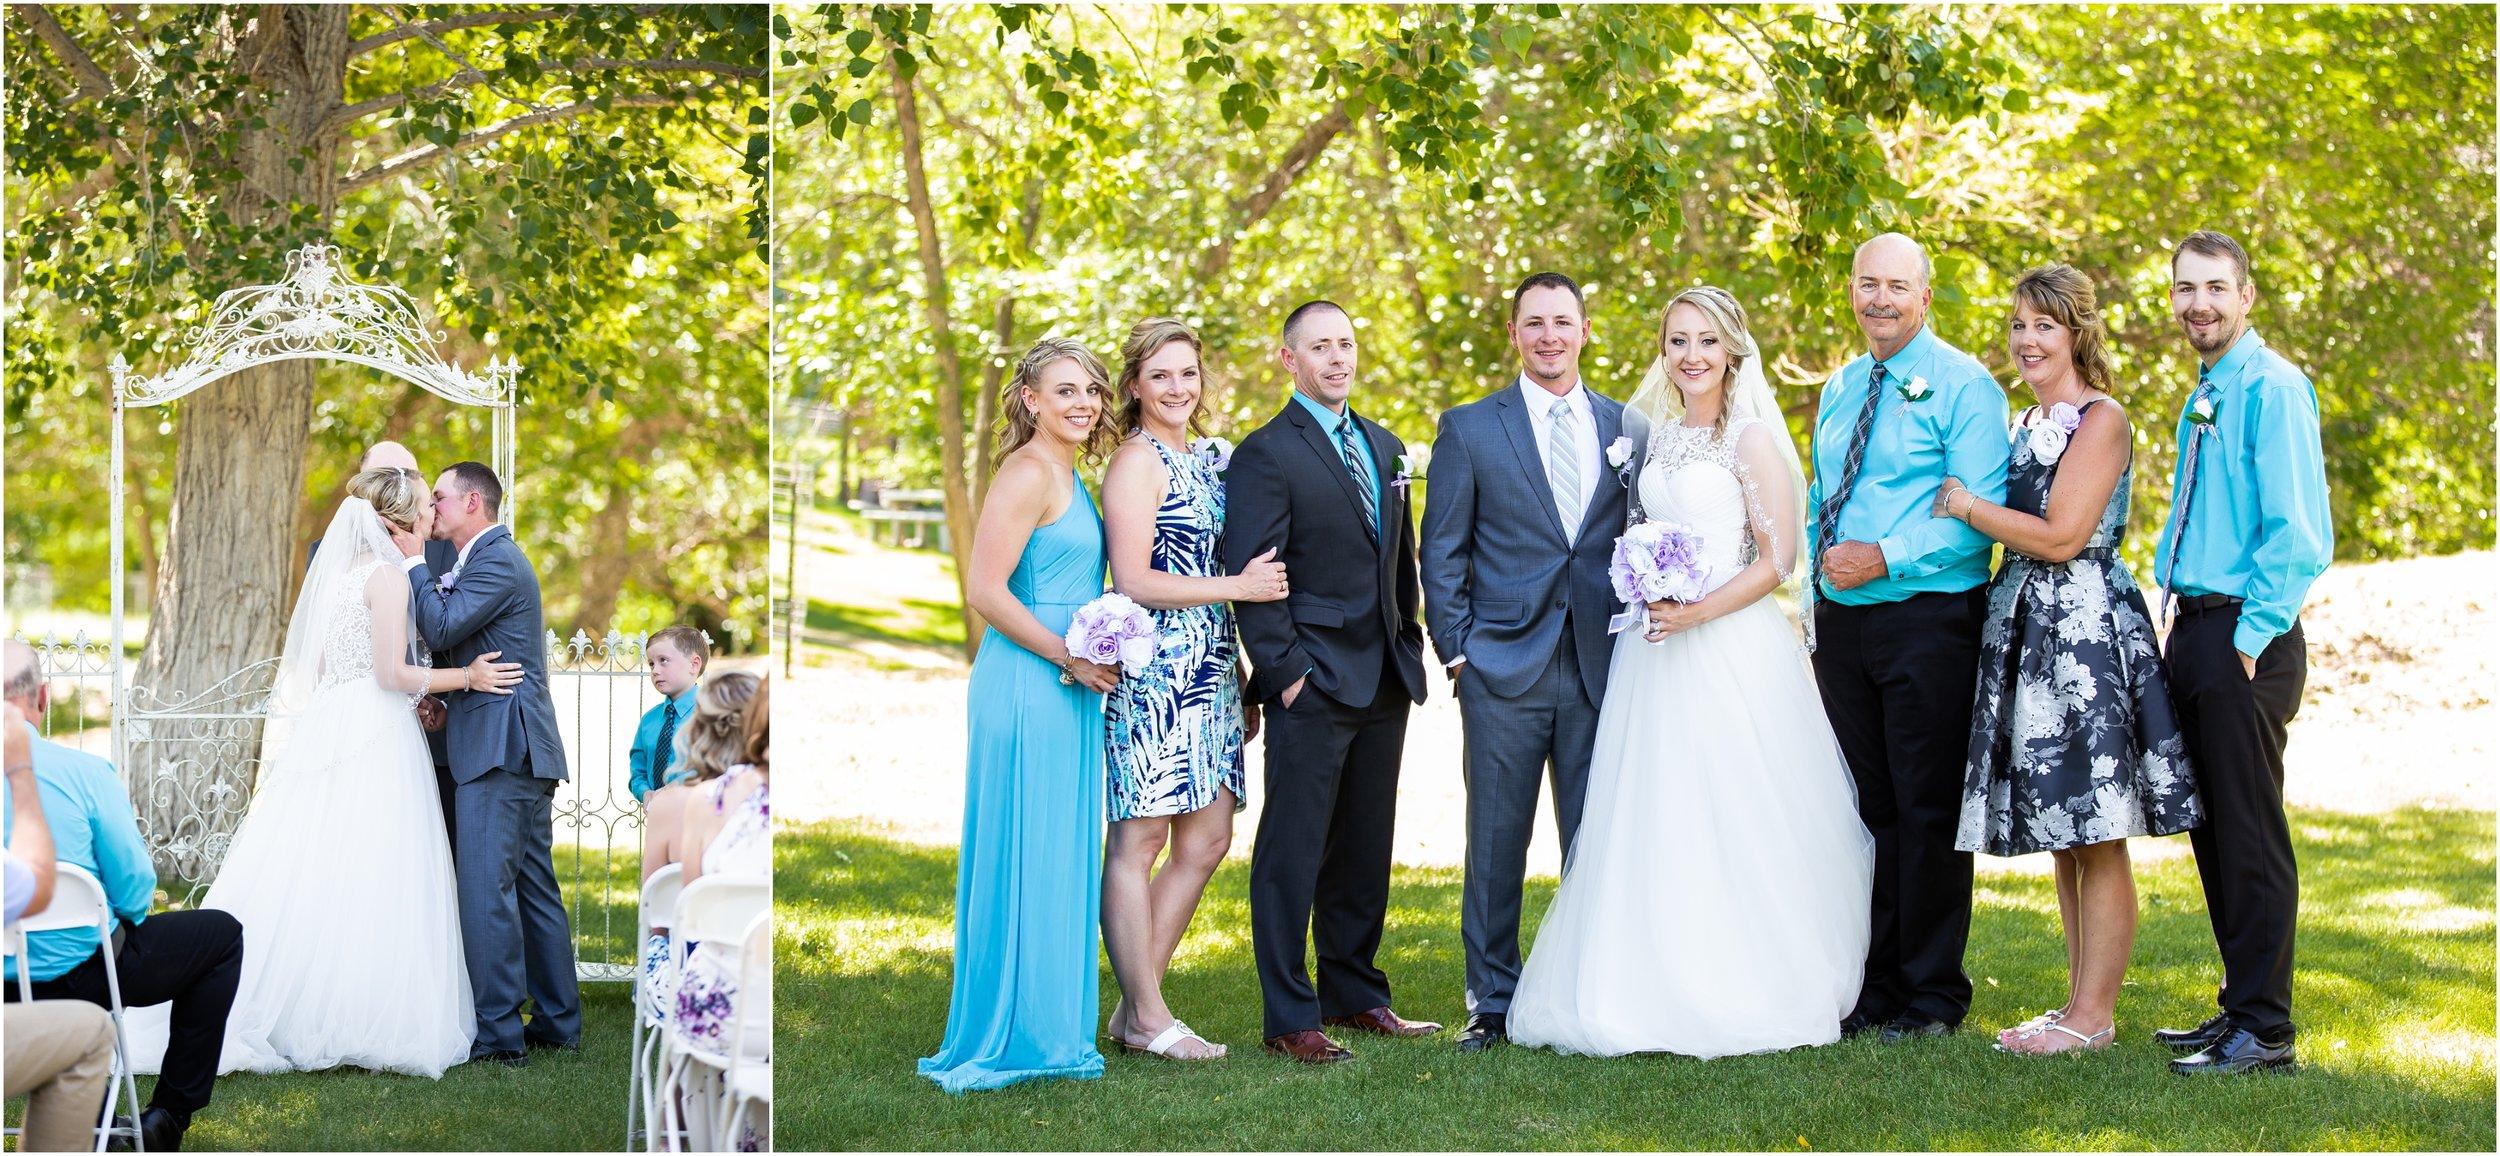 Grand Junction Wedding Photographer_0017.jpg